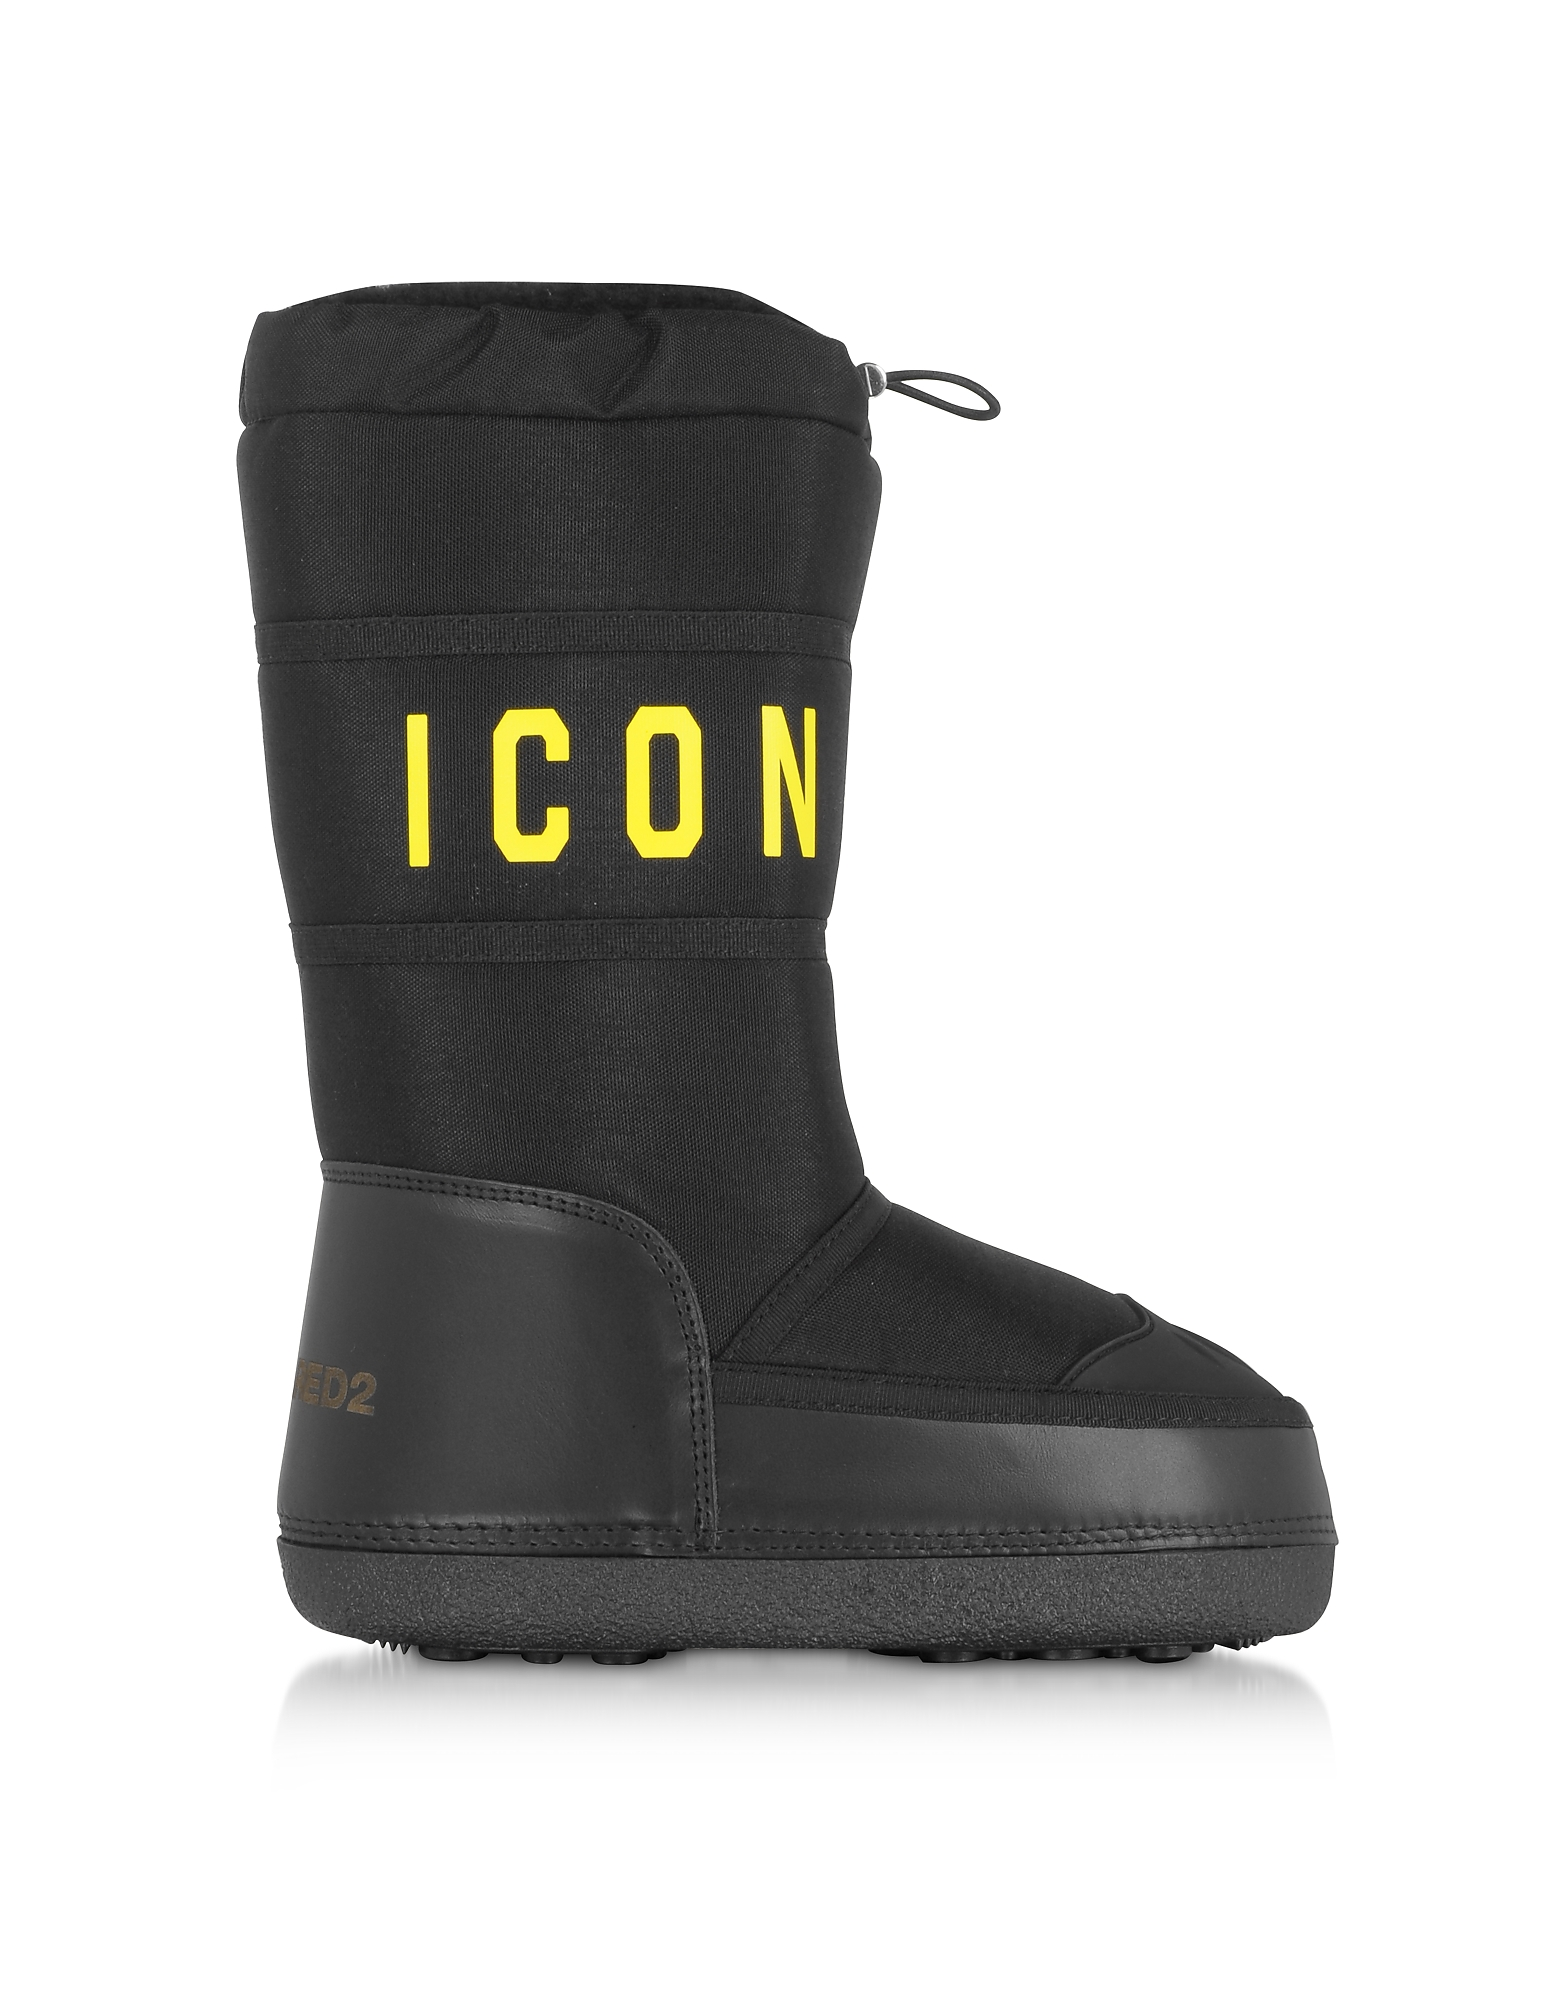 Icon Nylon Boots, Black